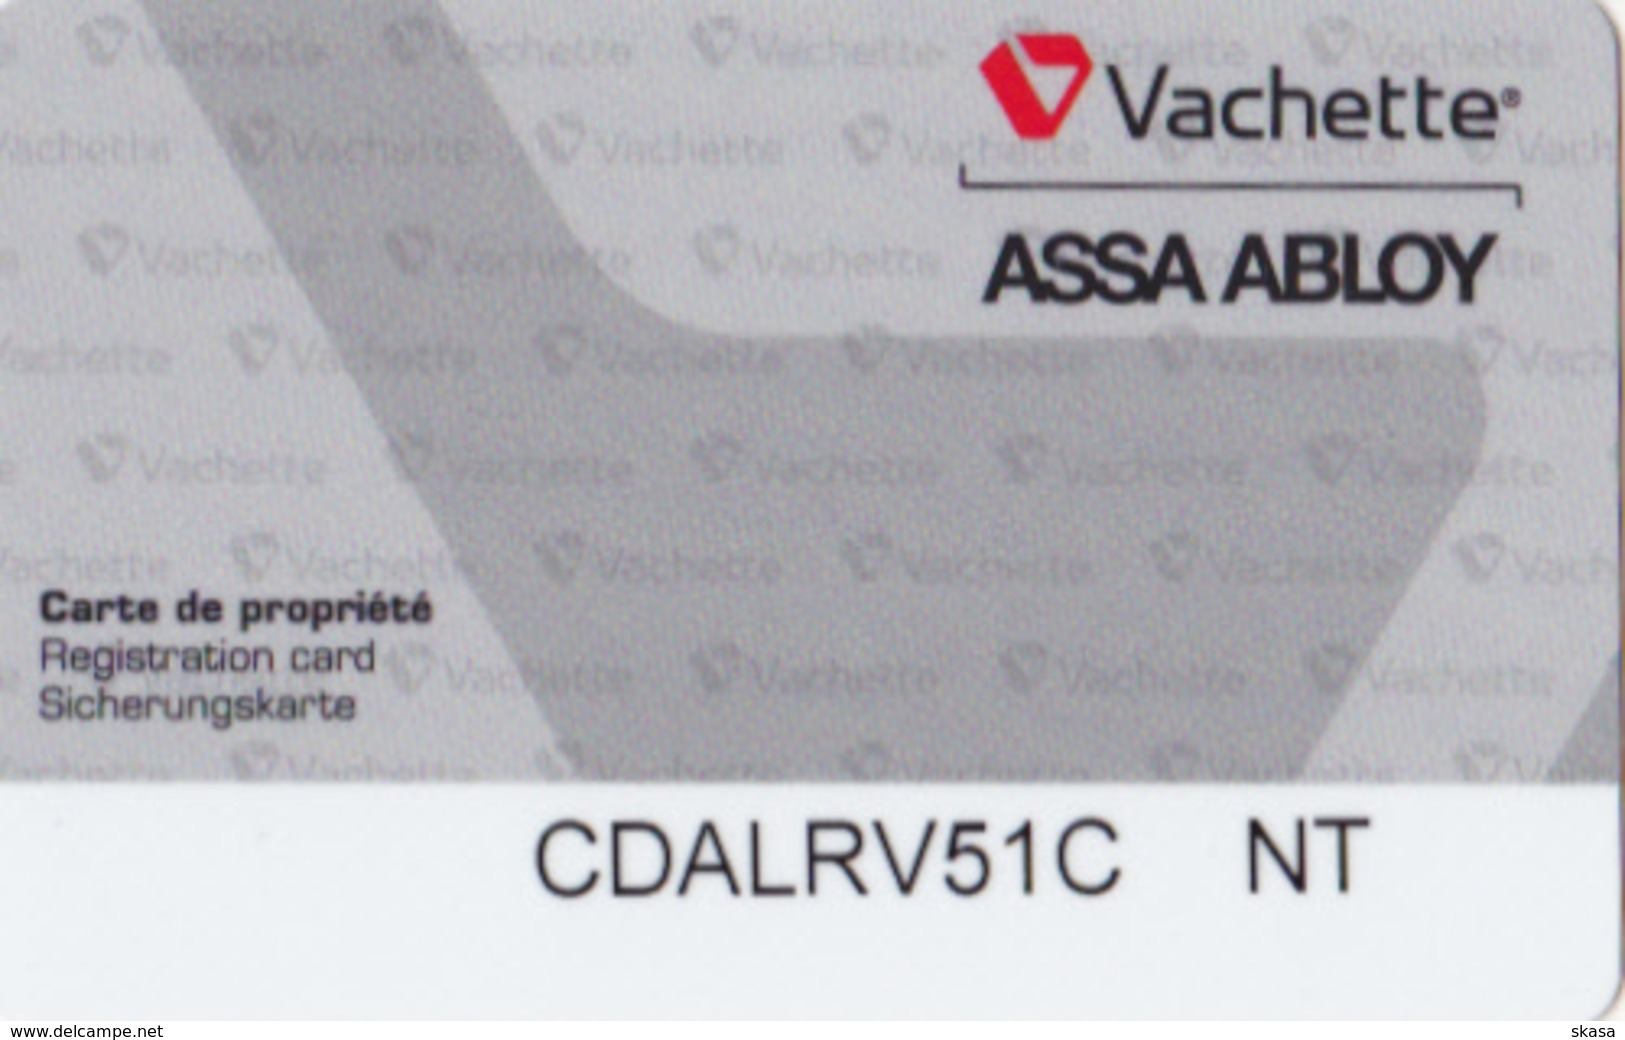 Carte Hotel Hostel Card Vachette ASSA ABLOY _0001 - Cartas De Hotels